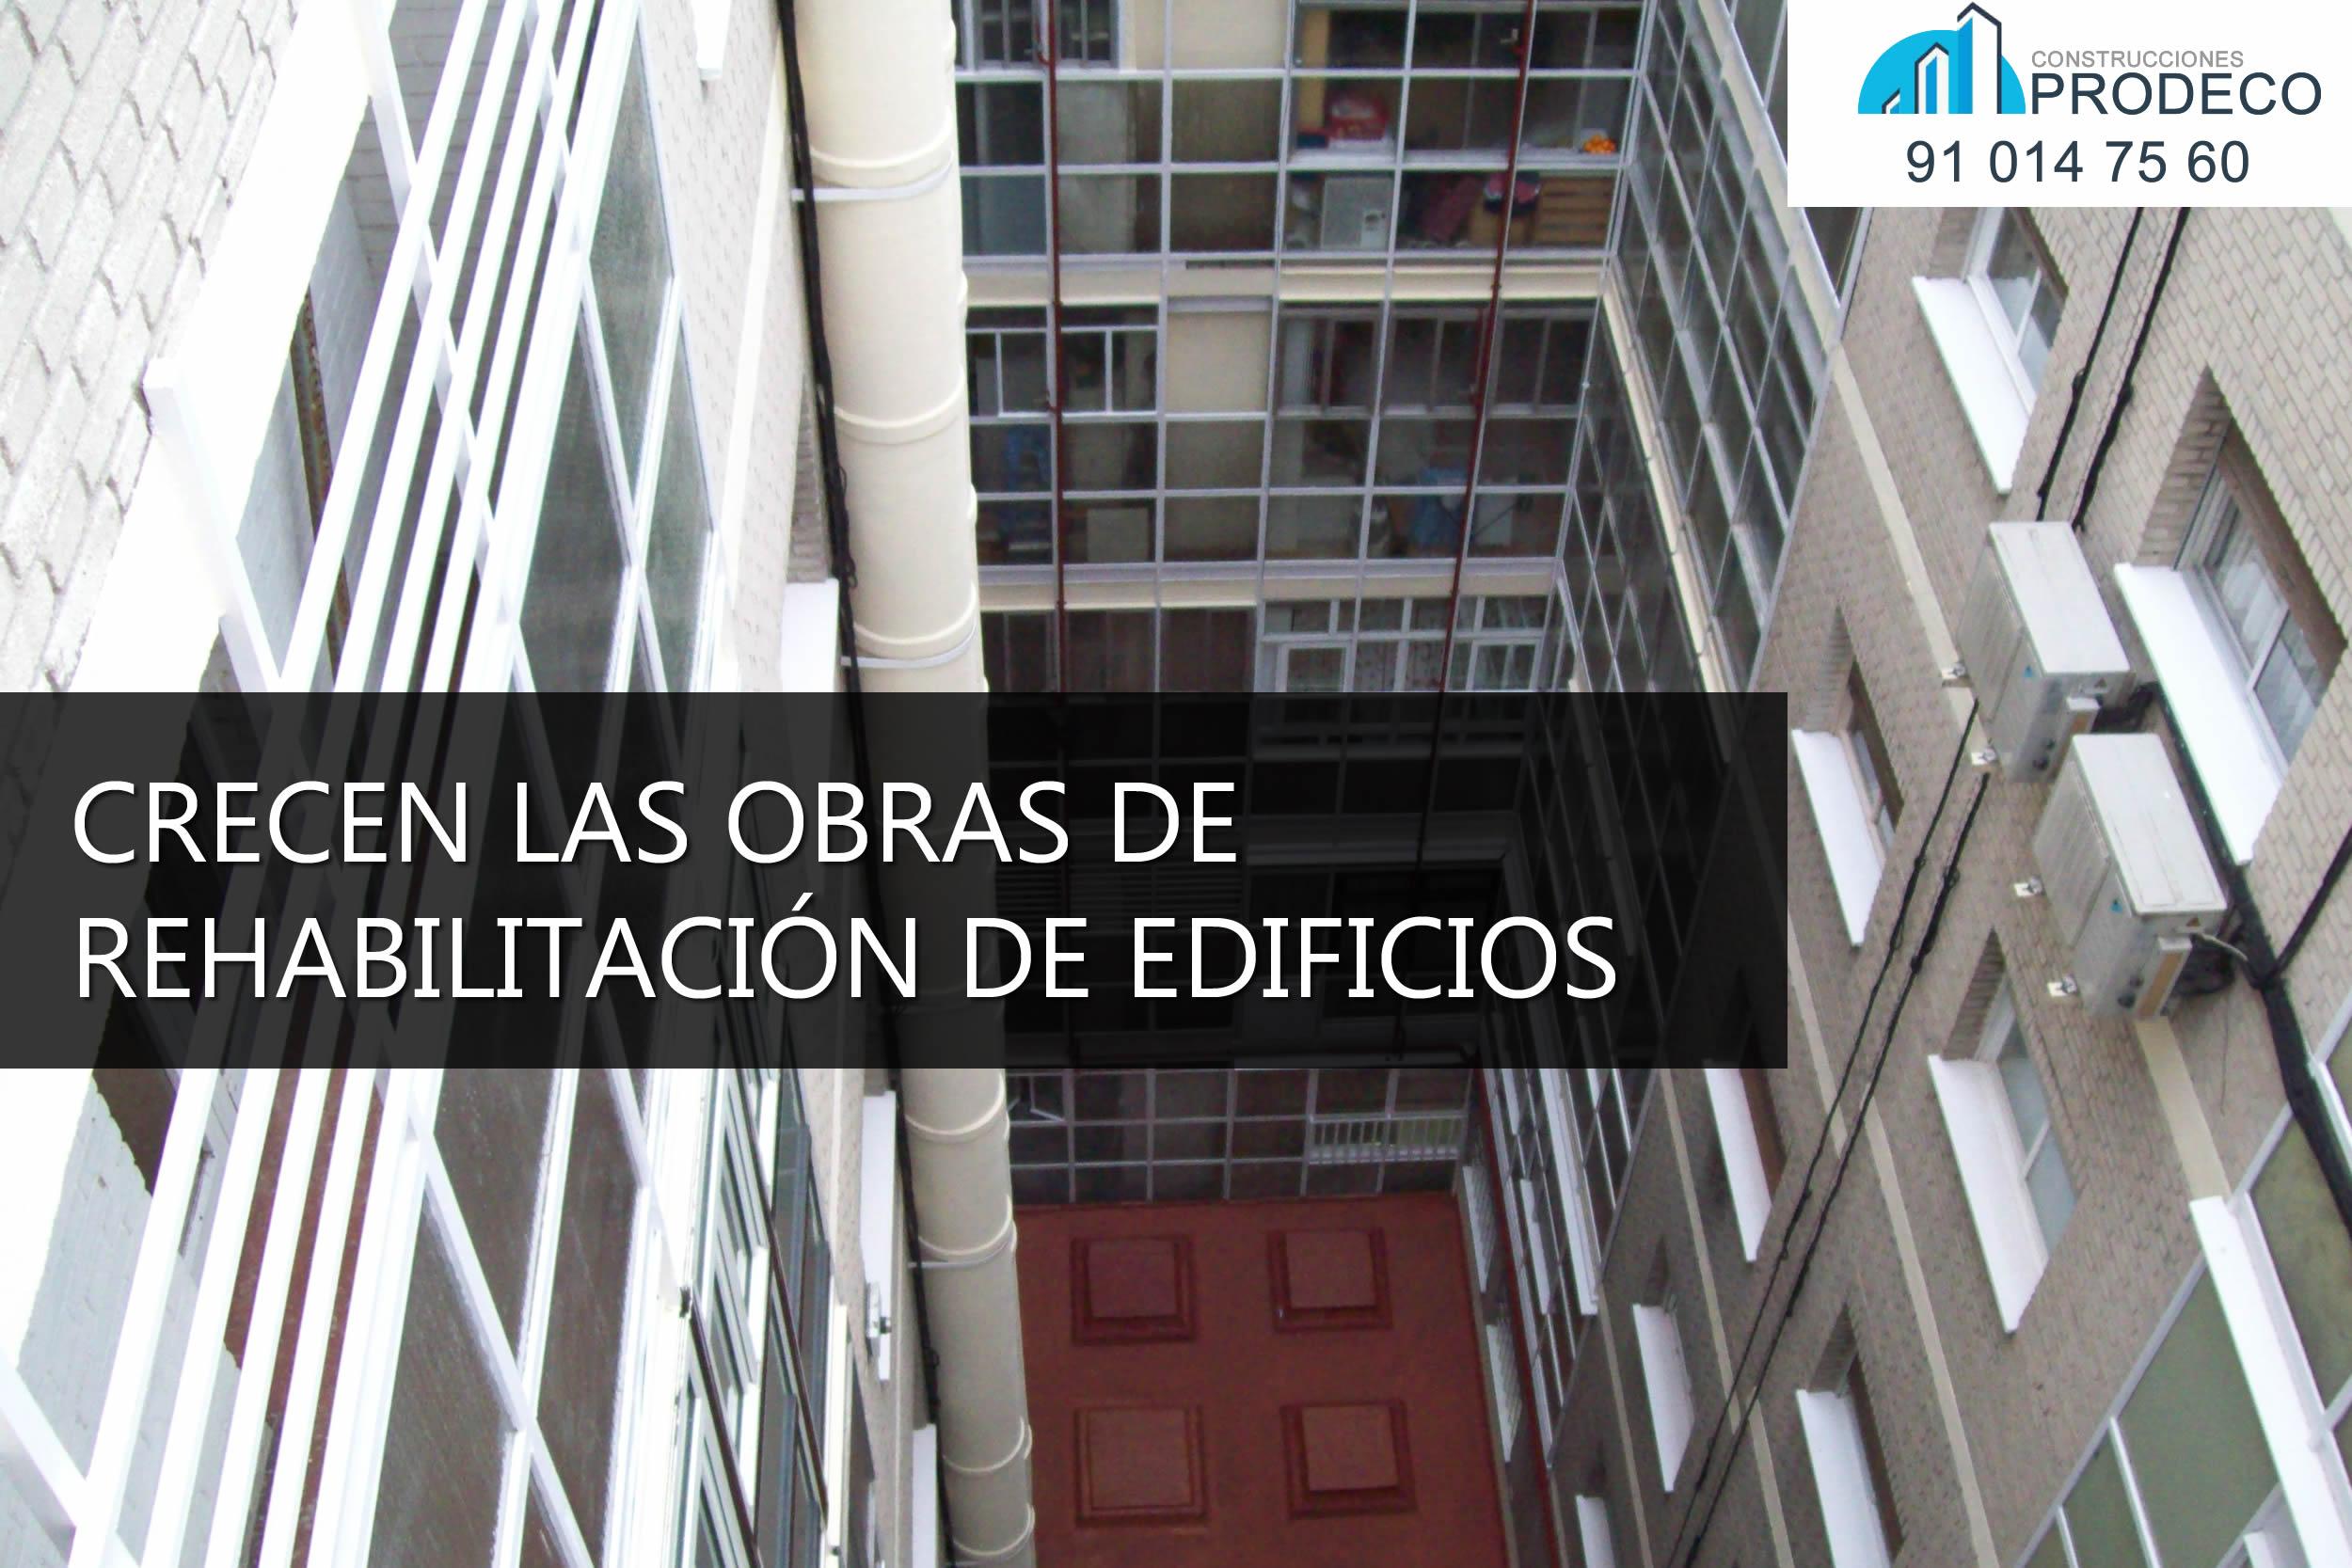 Crecen Las obras de Rehabilitación de Edificios